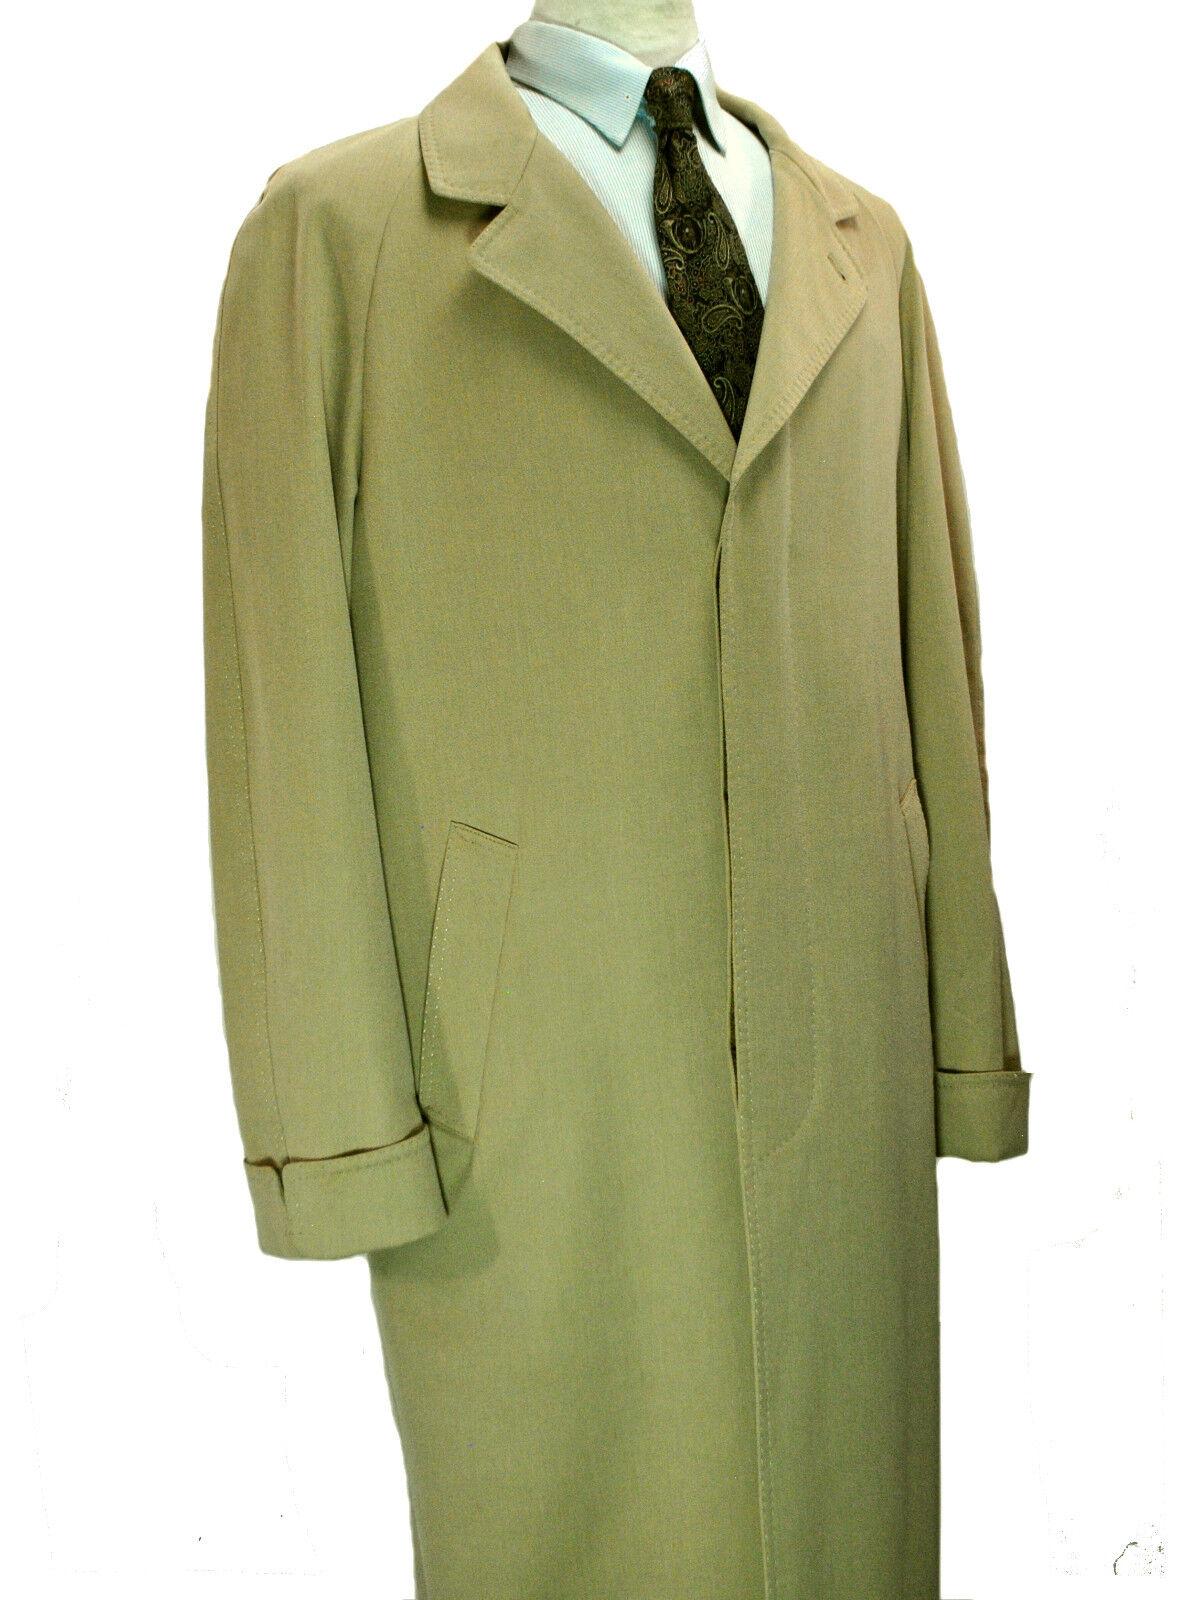 LGold Piana Storm System x Nordstrom Rain Coat 40 Short Med Overcoat Khaki Tan